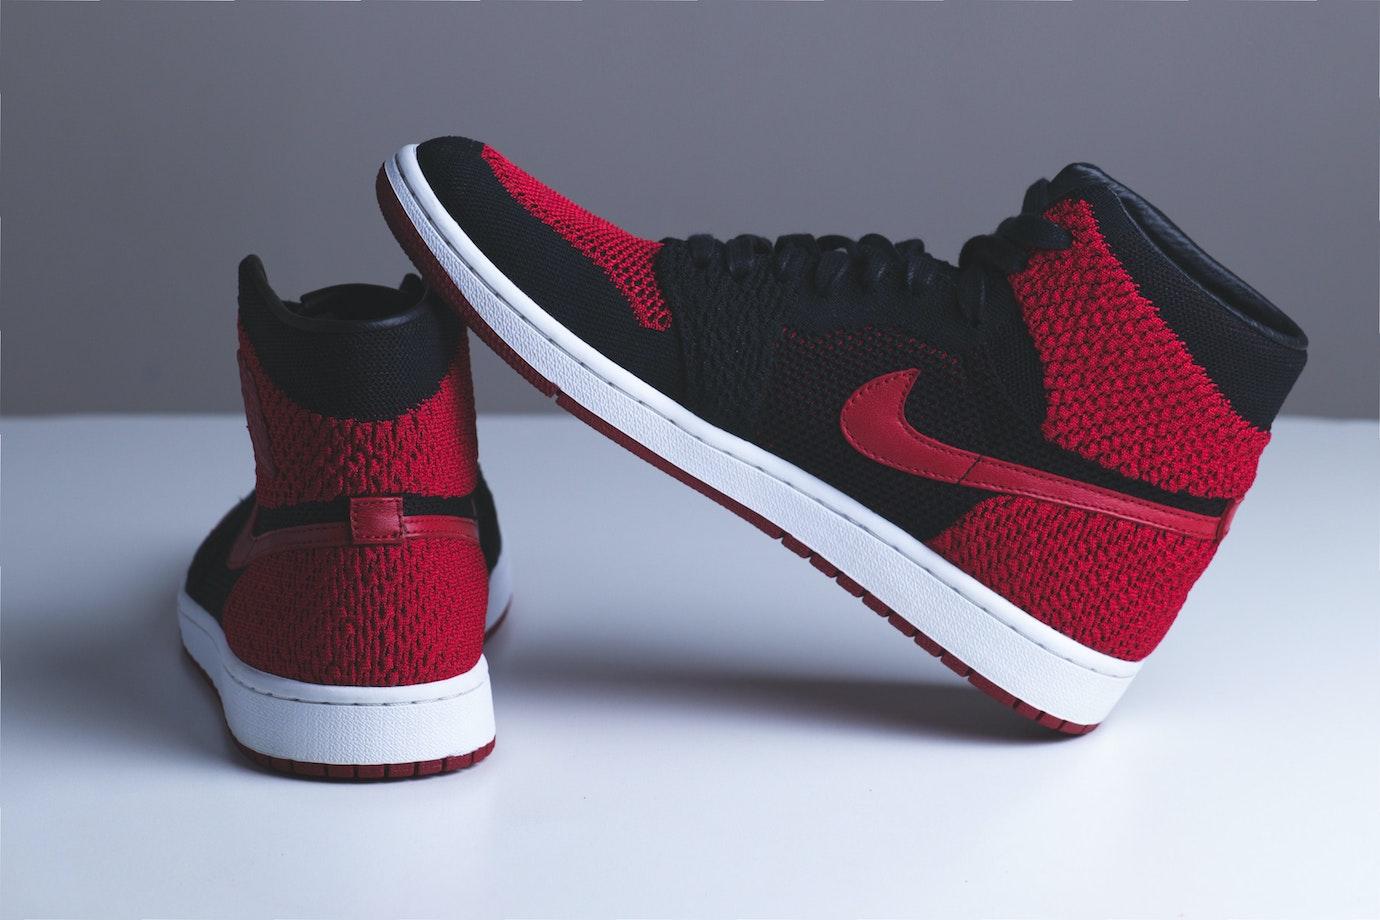 A pair of Nike sneakers